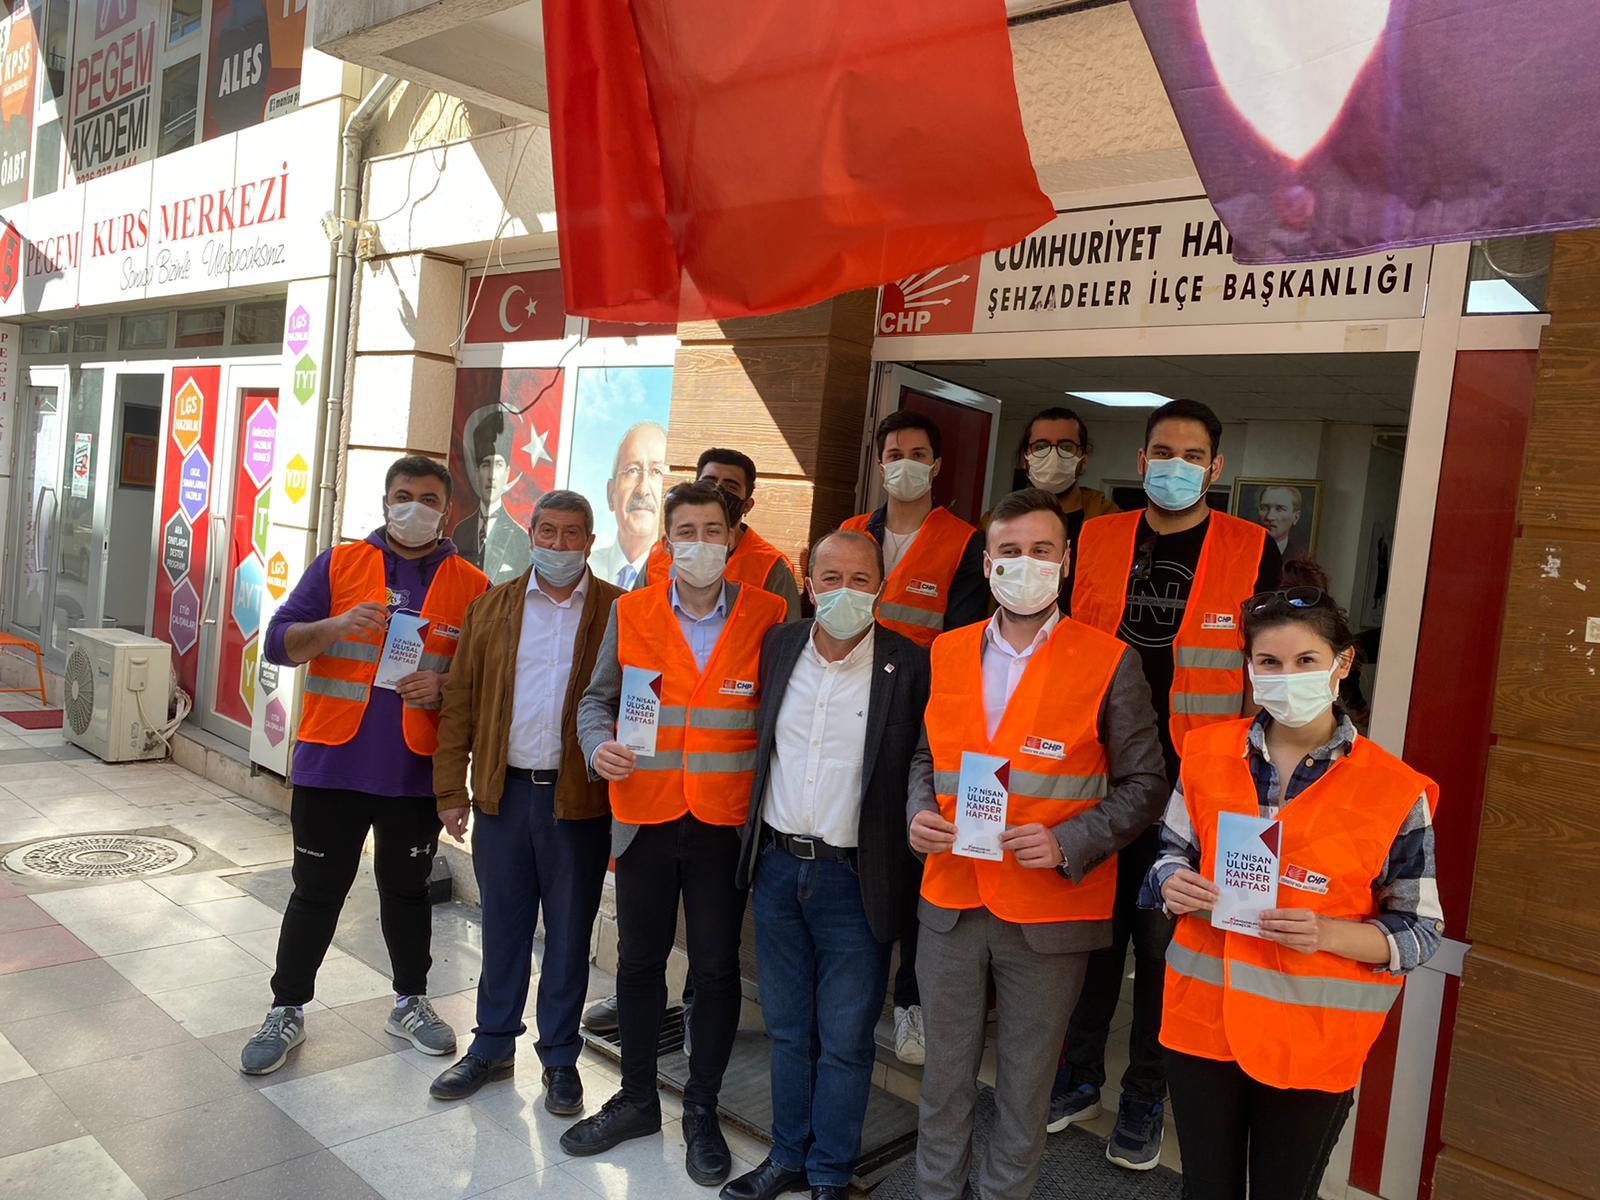 CHP'Lİ GENÇLER KANSERE KARŞI FARKINDALIK YARATTI